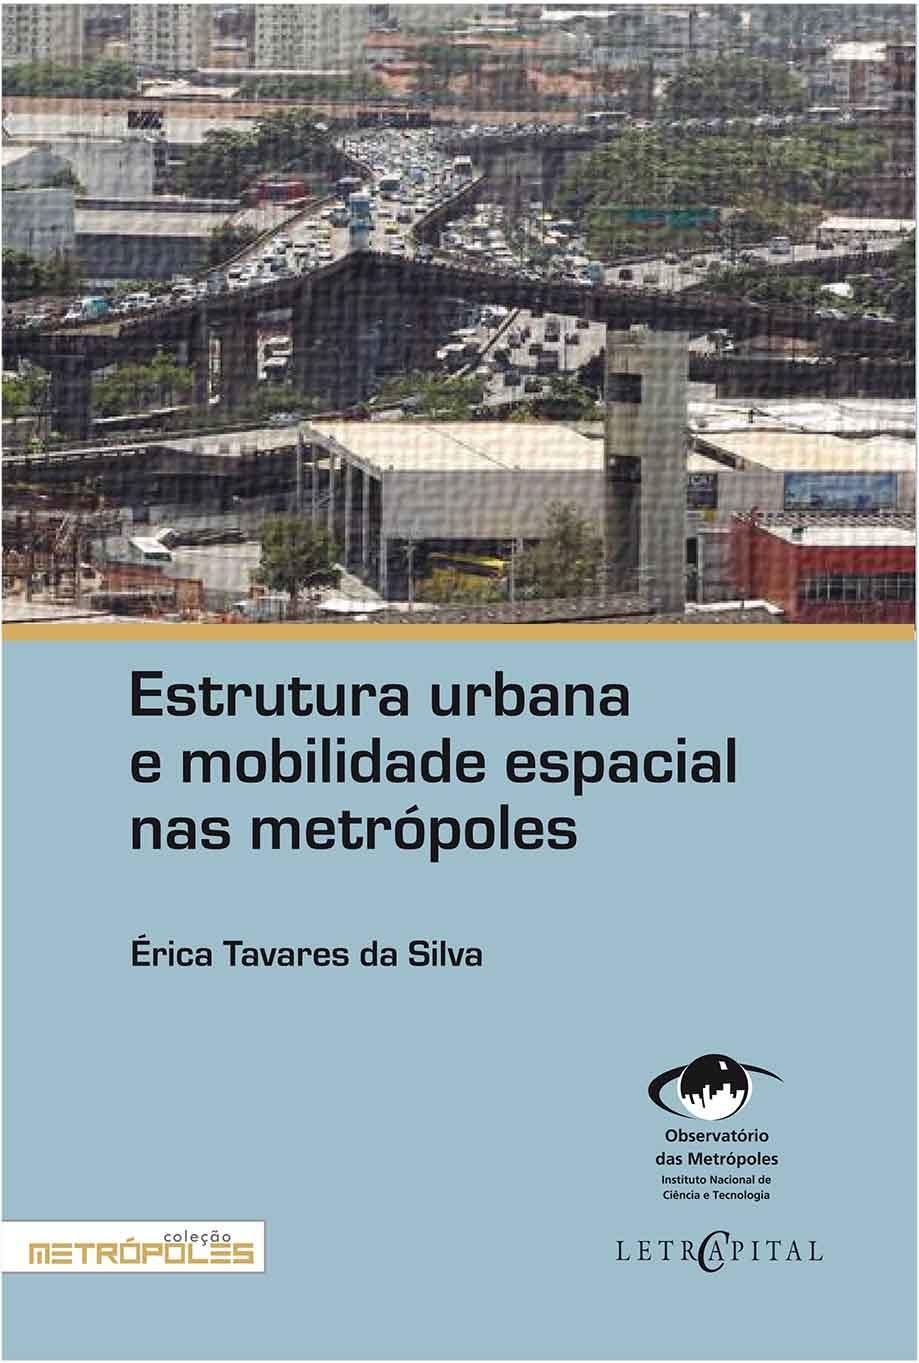 Estrutura urbana e mobilidade espacial nas metrópoles